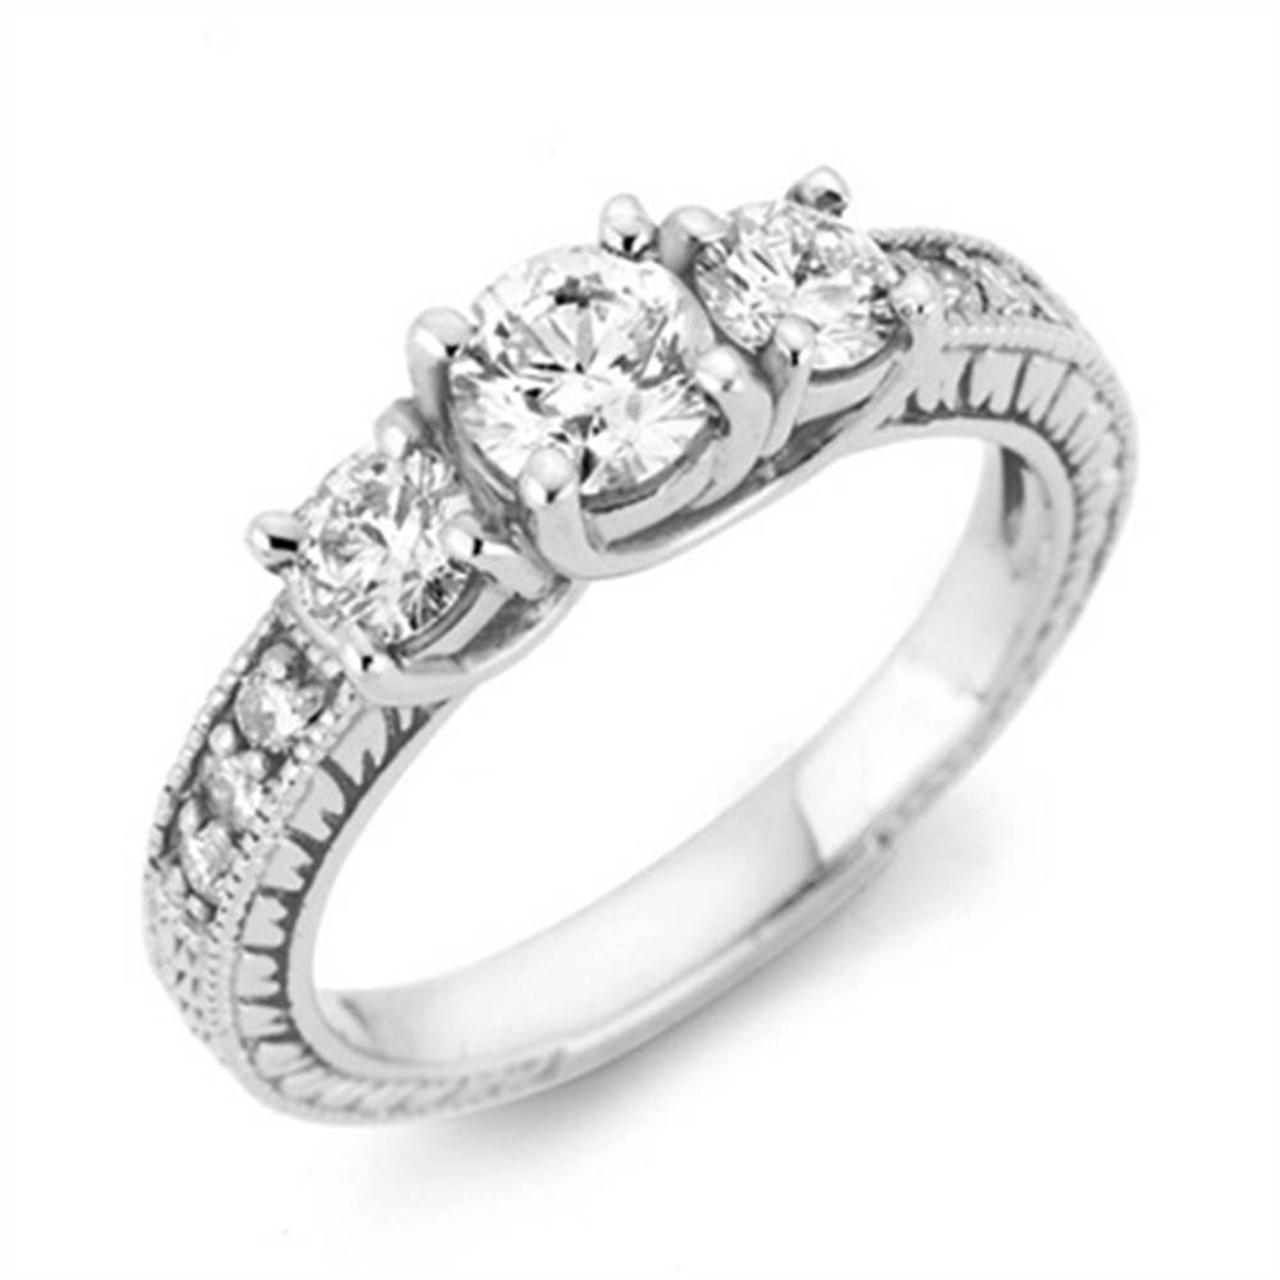 7110fe8a5ef6c 1 Carat Vintage 3-Stone Diamond Engagement Anniversary Ring 10k ...